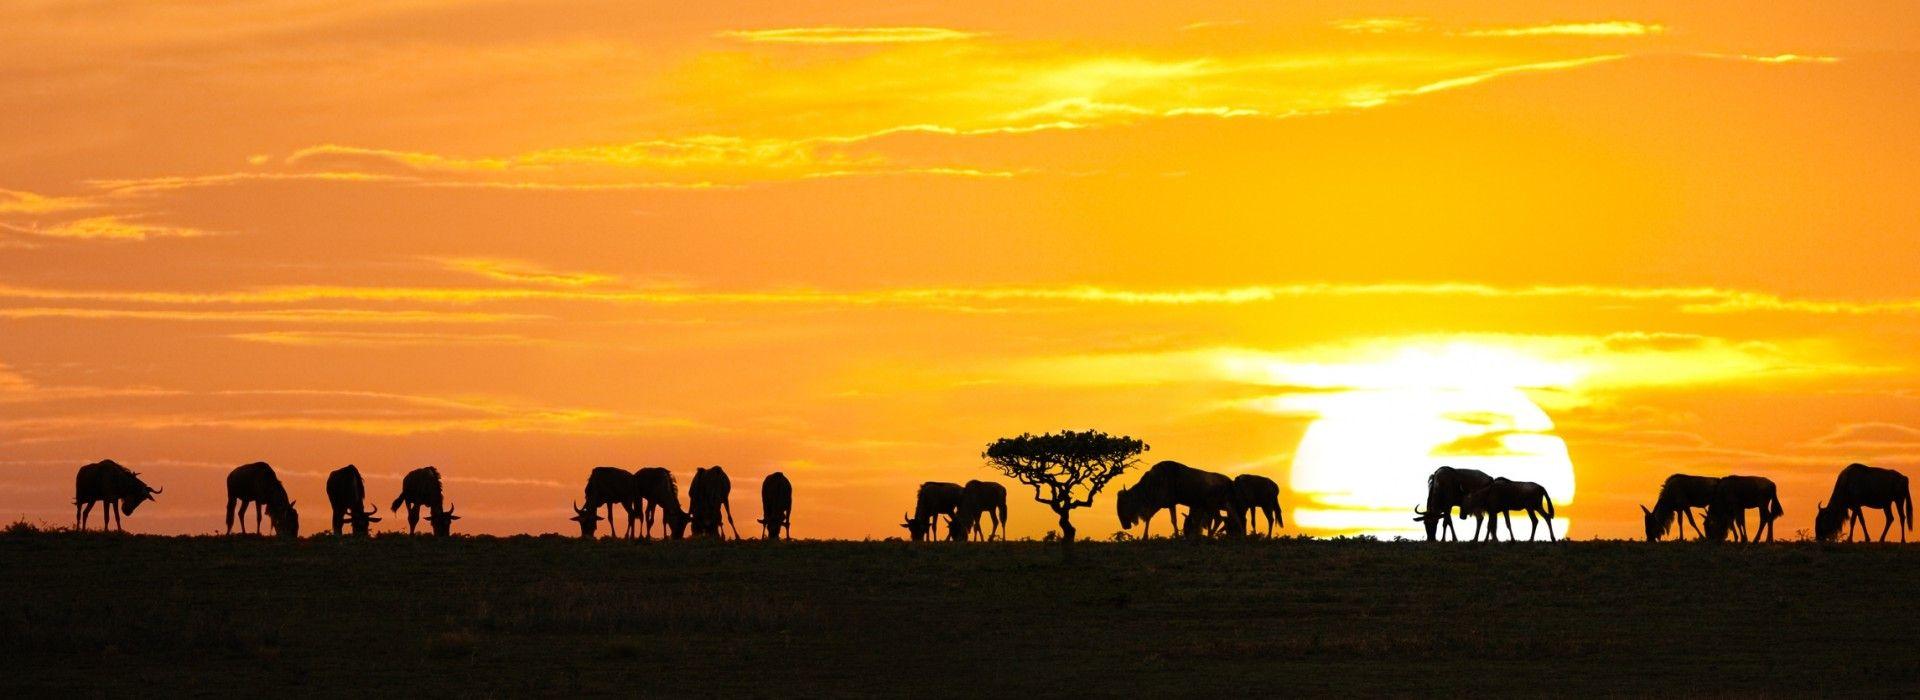 Trekking Tours in Arusha